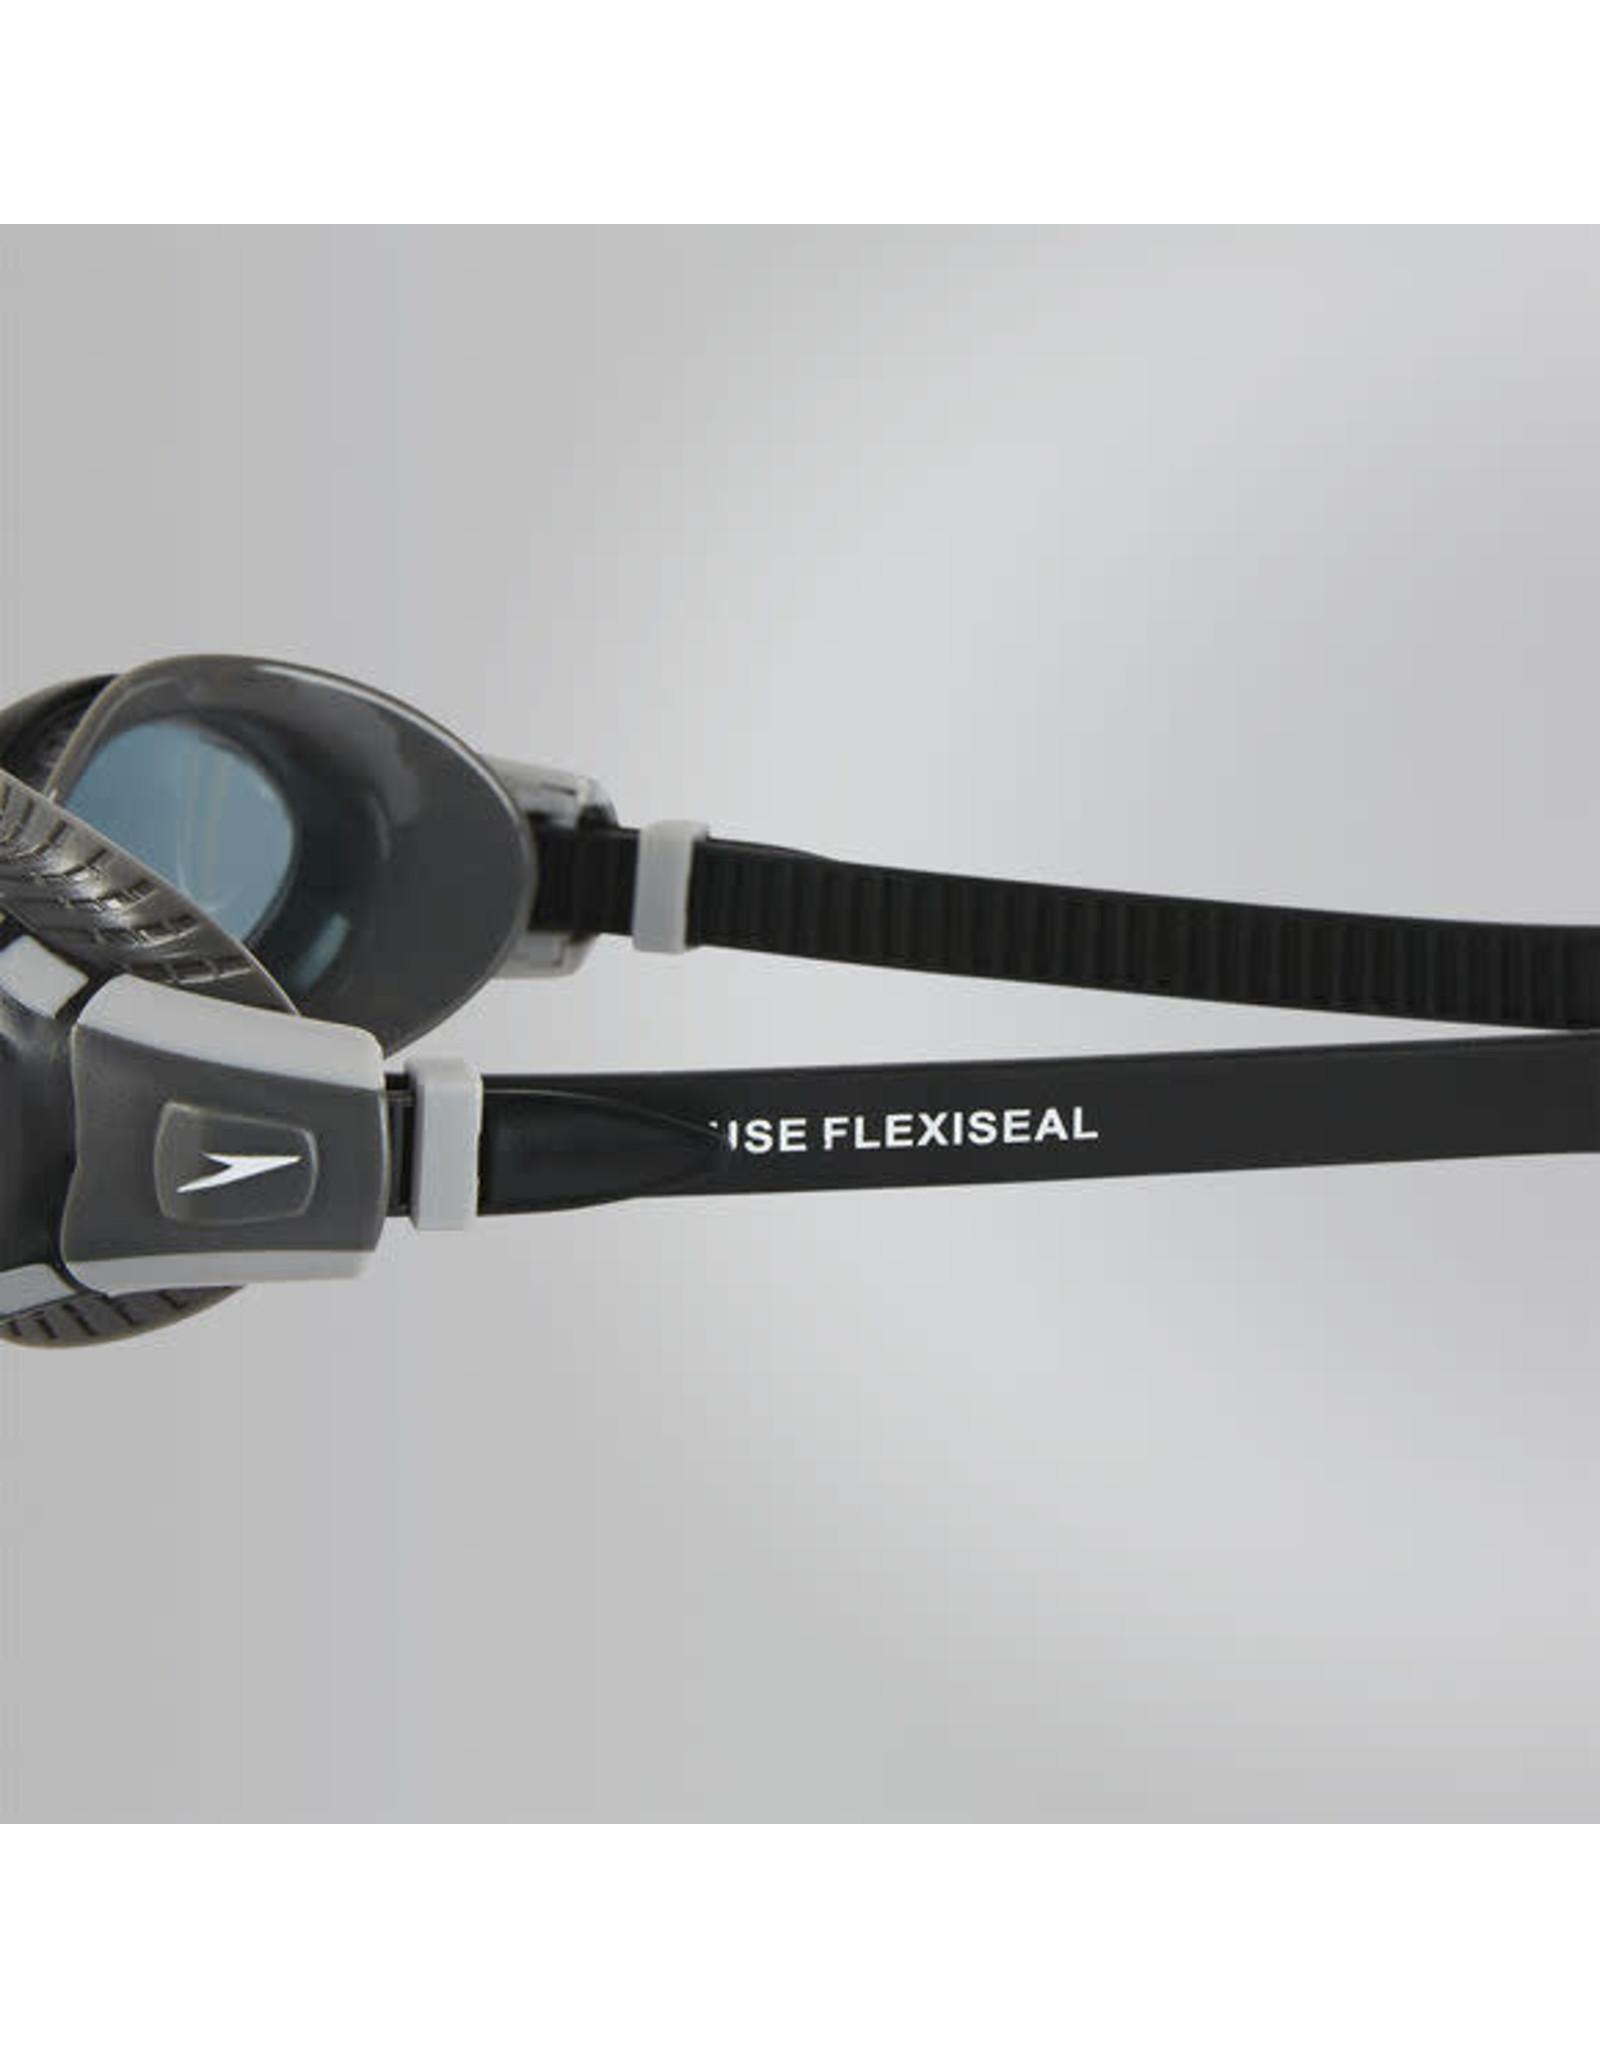 Speedo Futura Biofuse Flex Goggles - Black